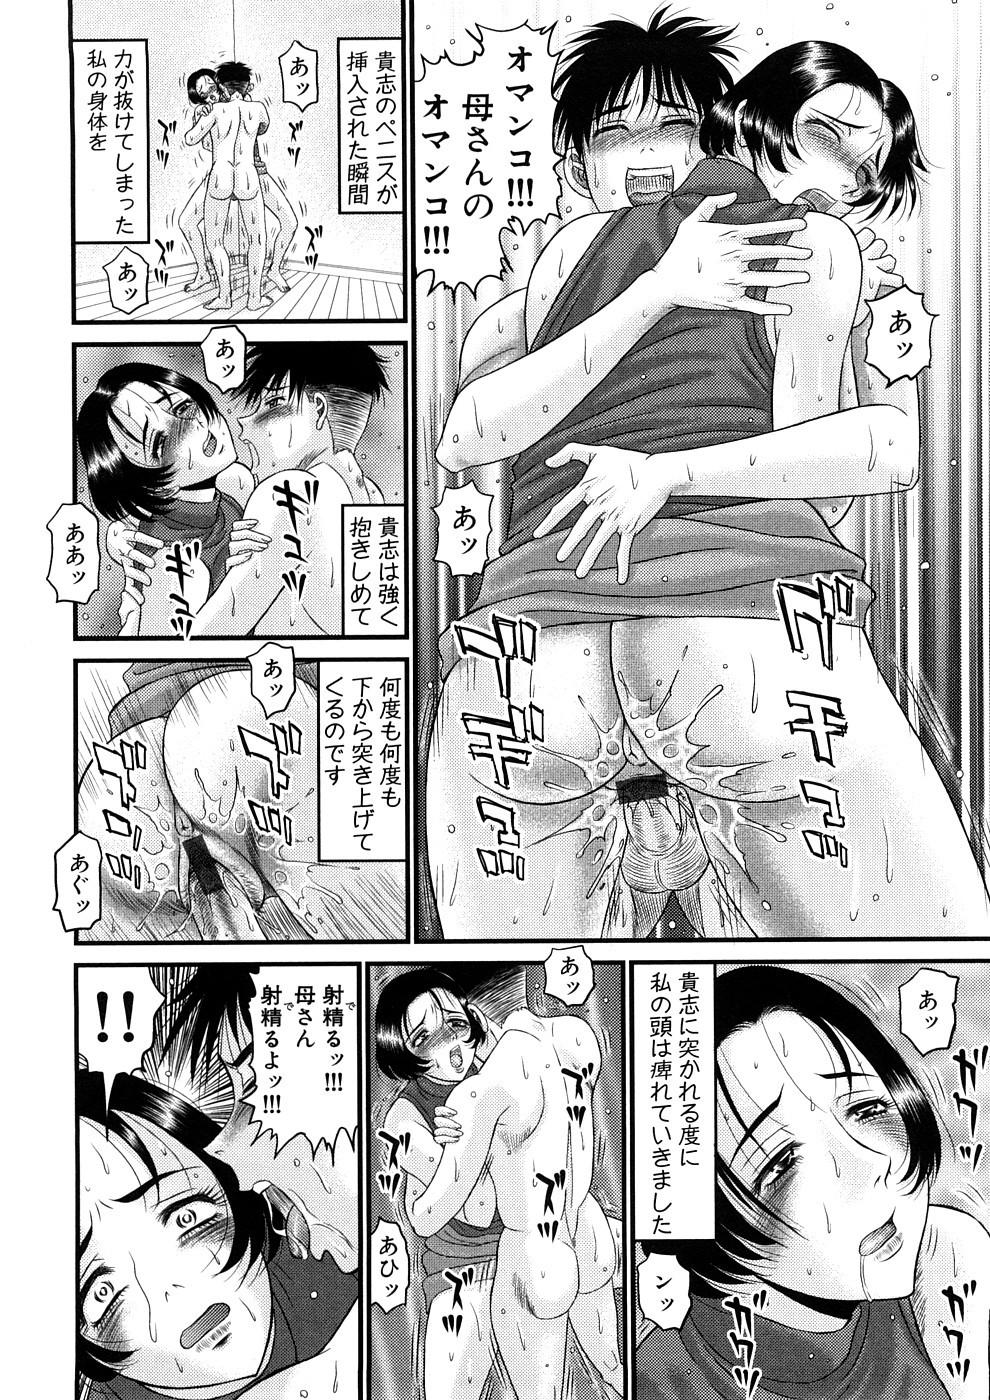 Geki Yaba Anthology Vol. 1 - Naka ni Dashite yo 160